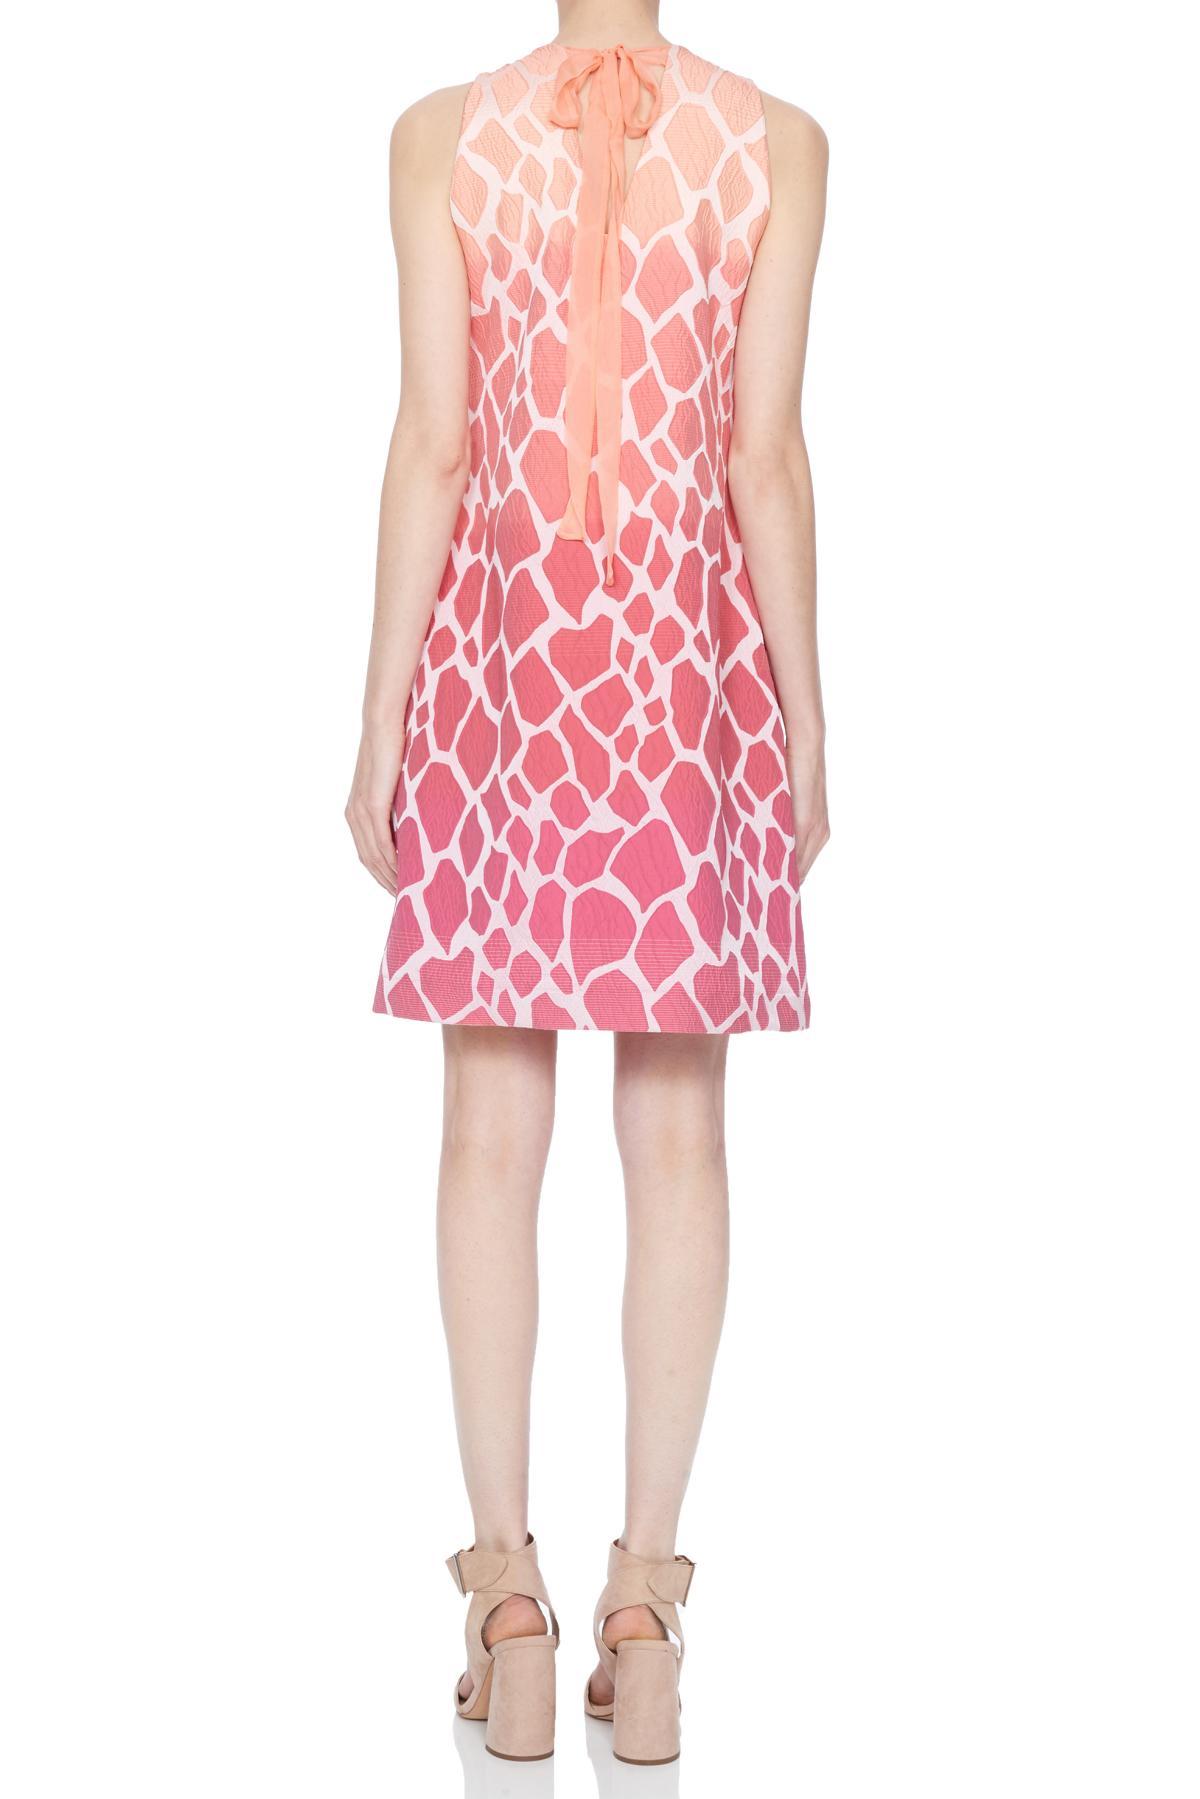 Rückansicht von Ana Alcazar Sixties Kleid Nalanis  angezogen an Model